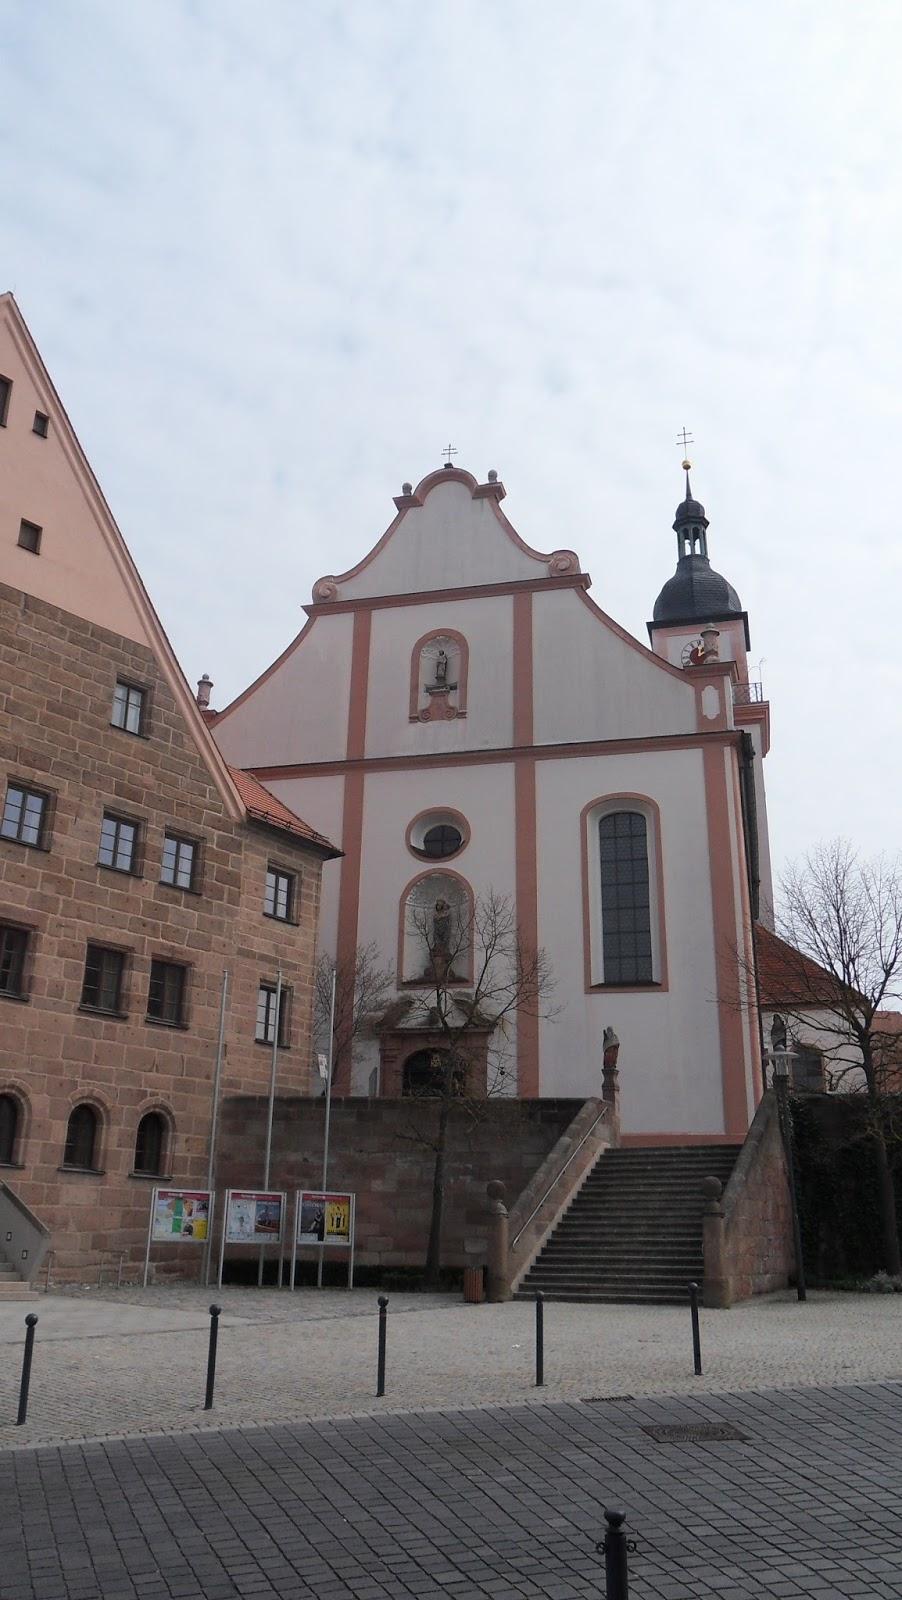 Hilpoltstein kath kirche Stadtpfarrkirche St.